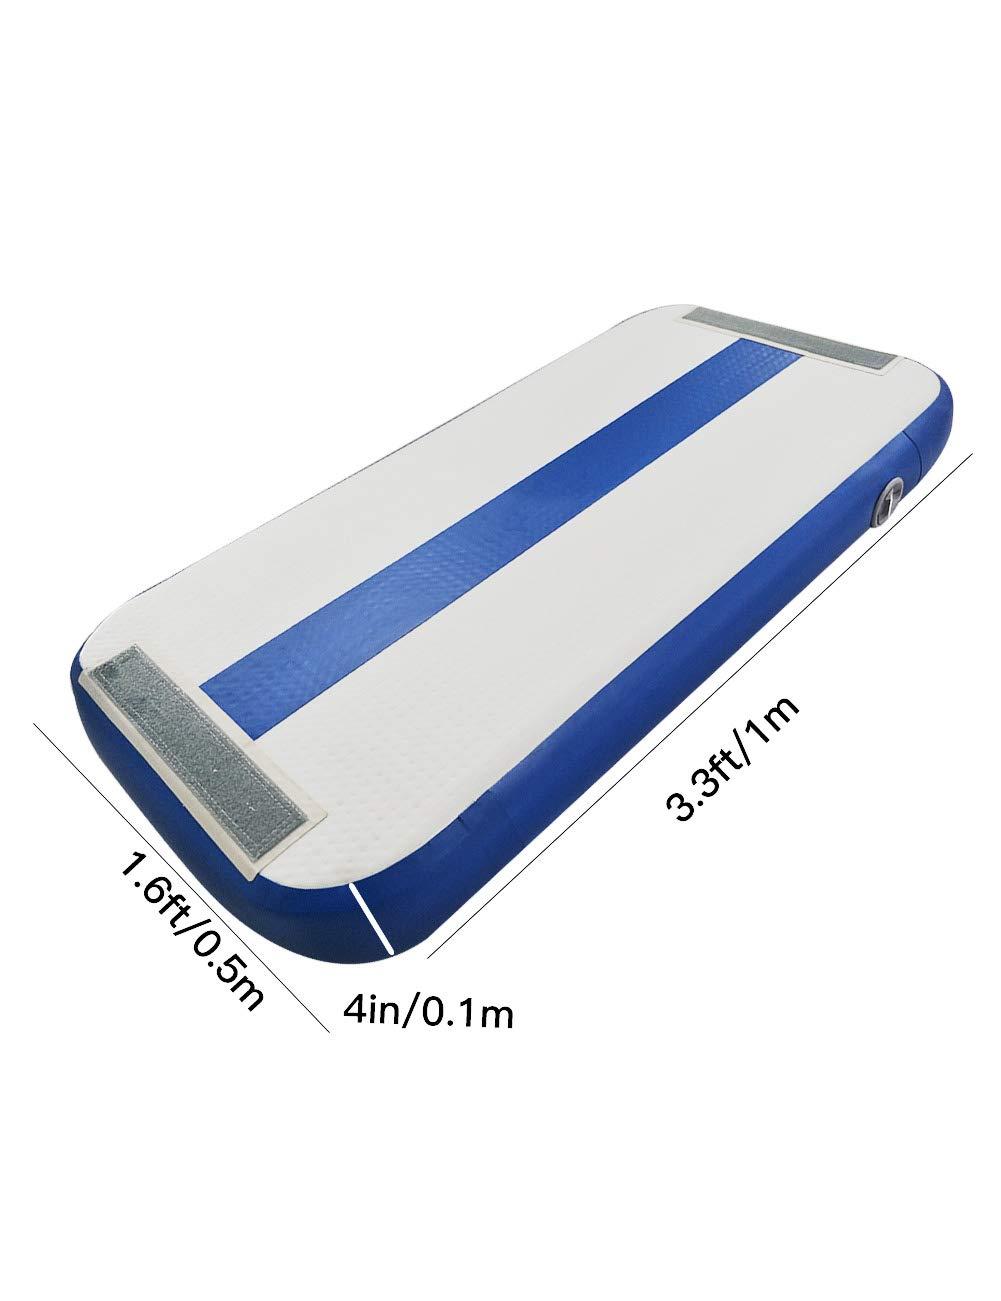 Amazon.com: AIRMAT FACTORY Air Track Gymnastics ...